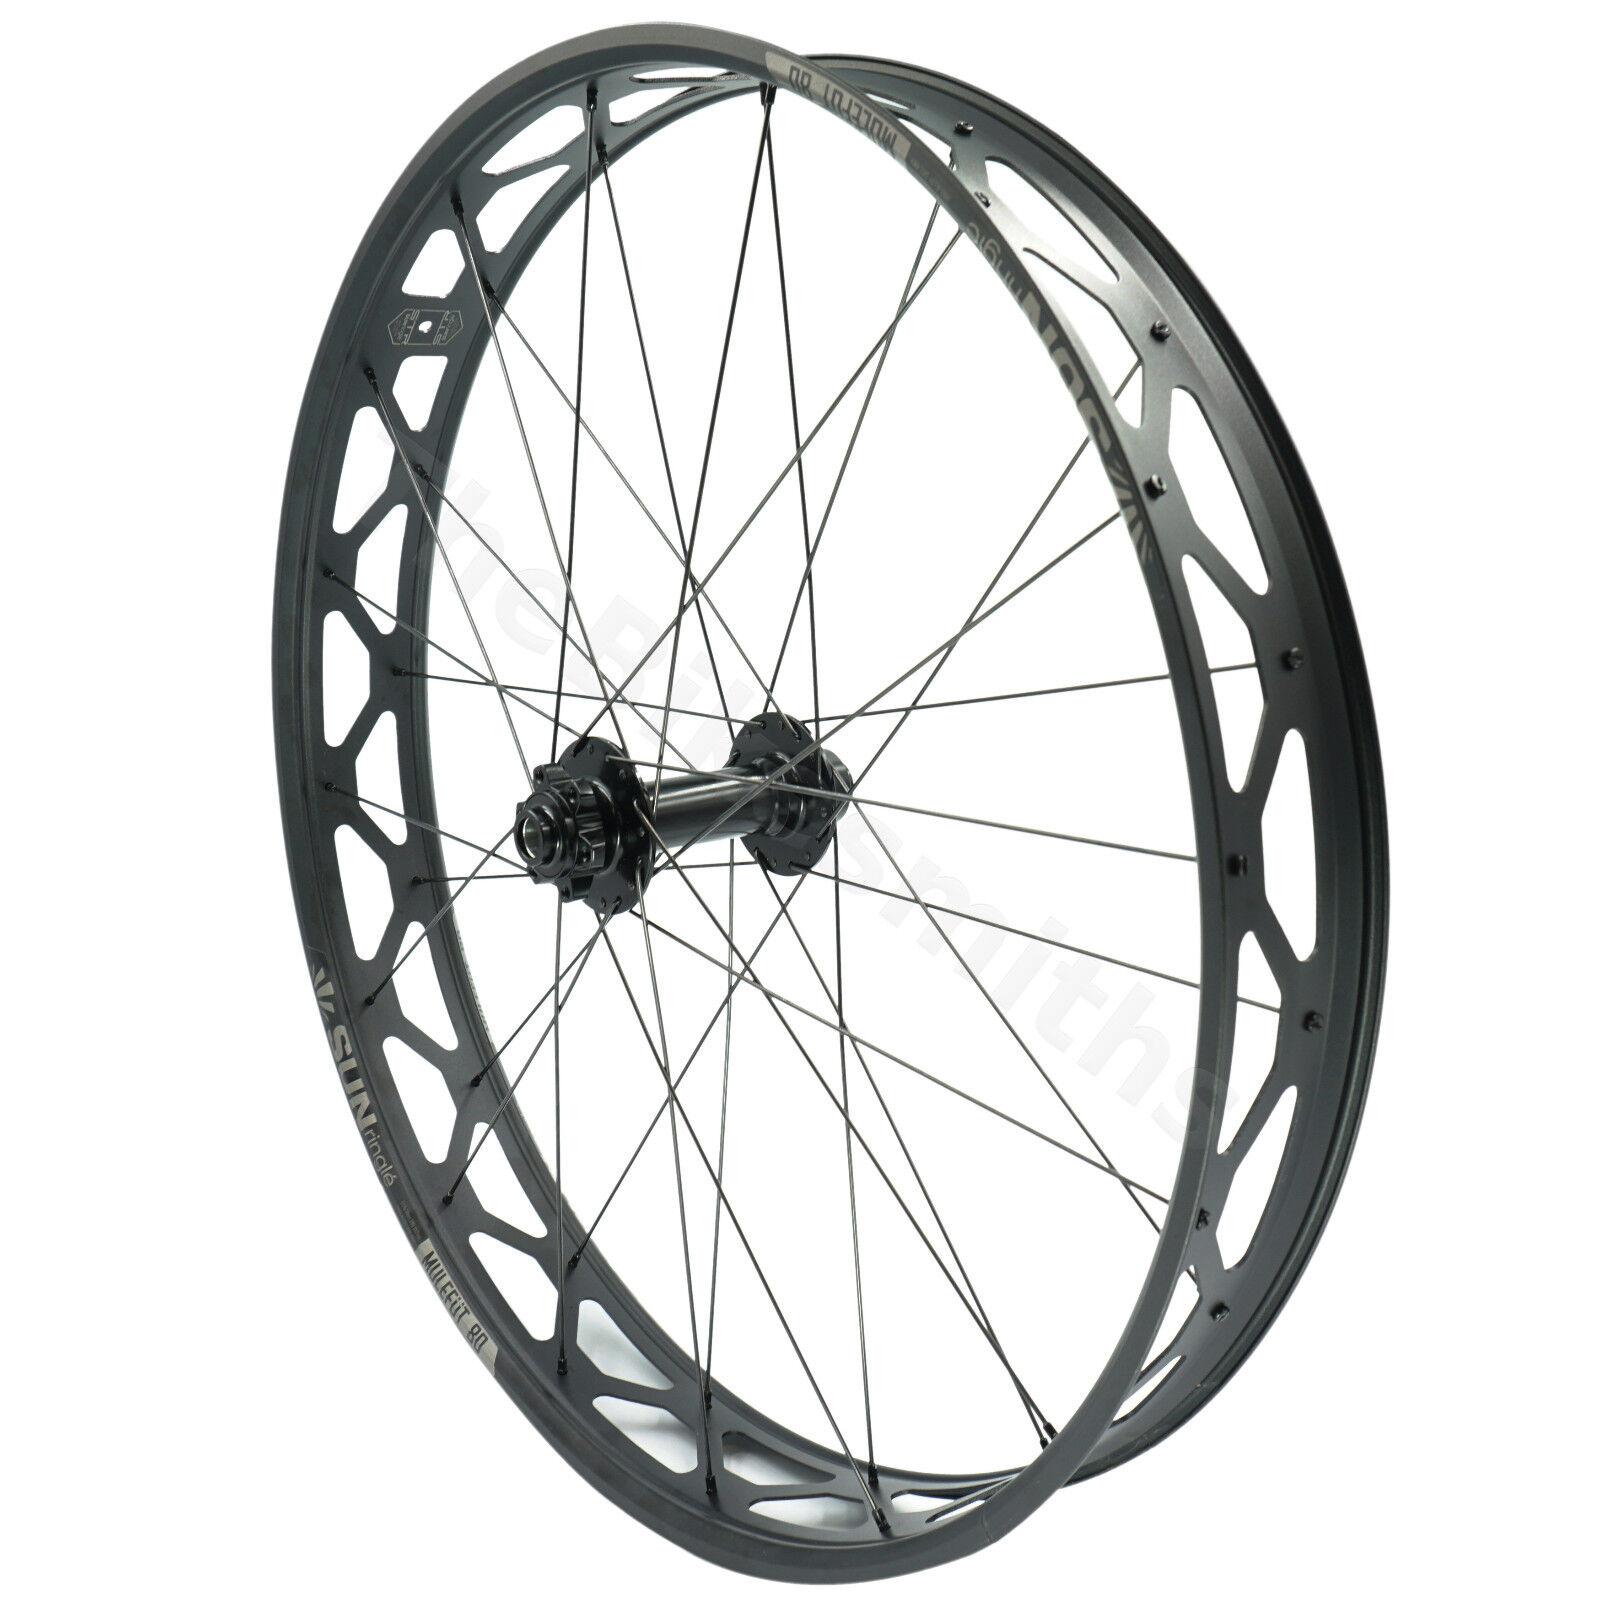 Sun Ringle MULEFUT V2 15x150 FORMULA Thru Axle Fat Bike FRONT Wheel fit blueeto